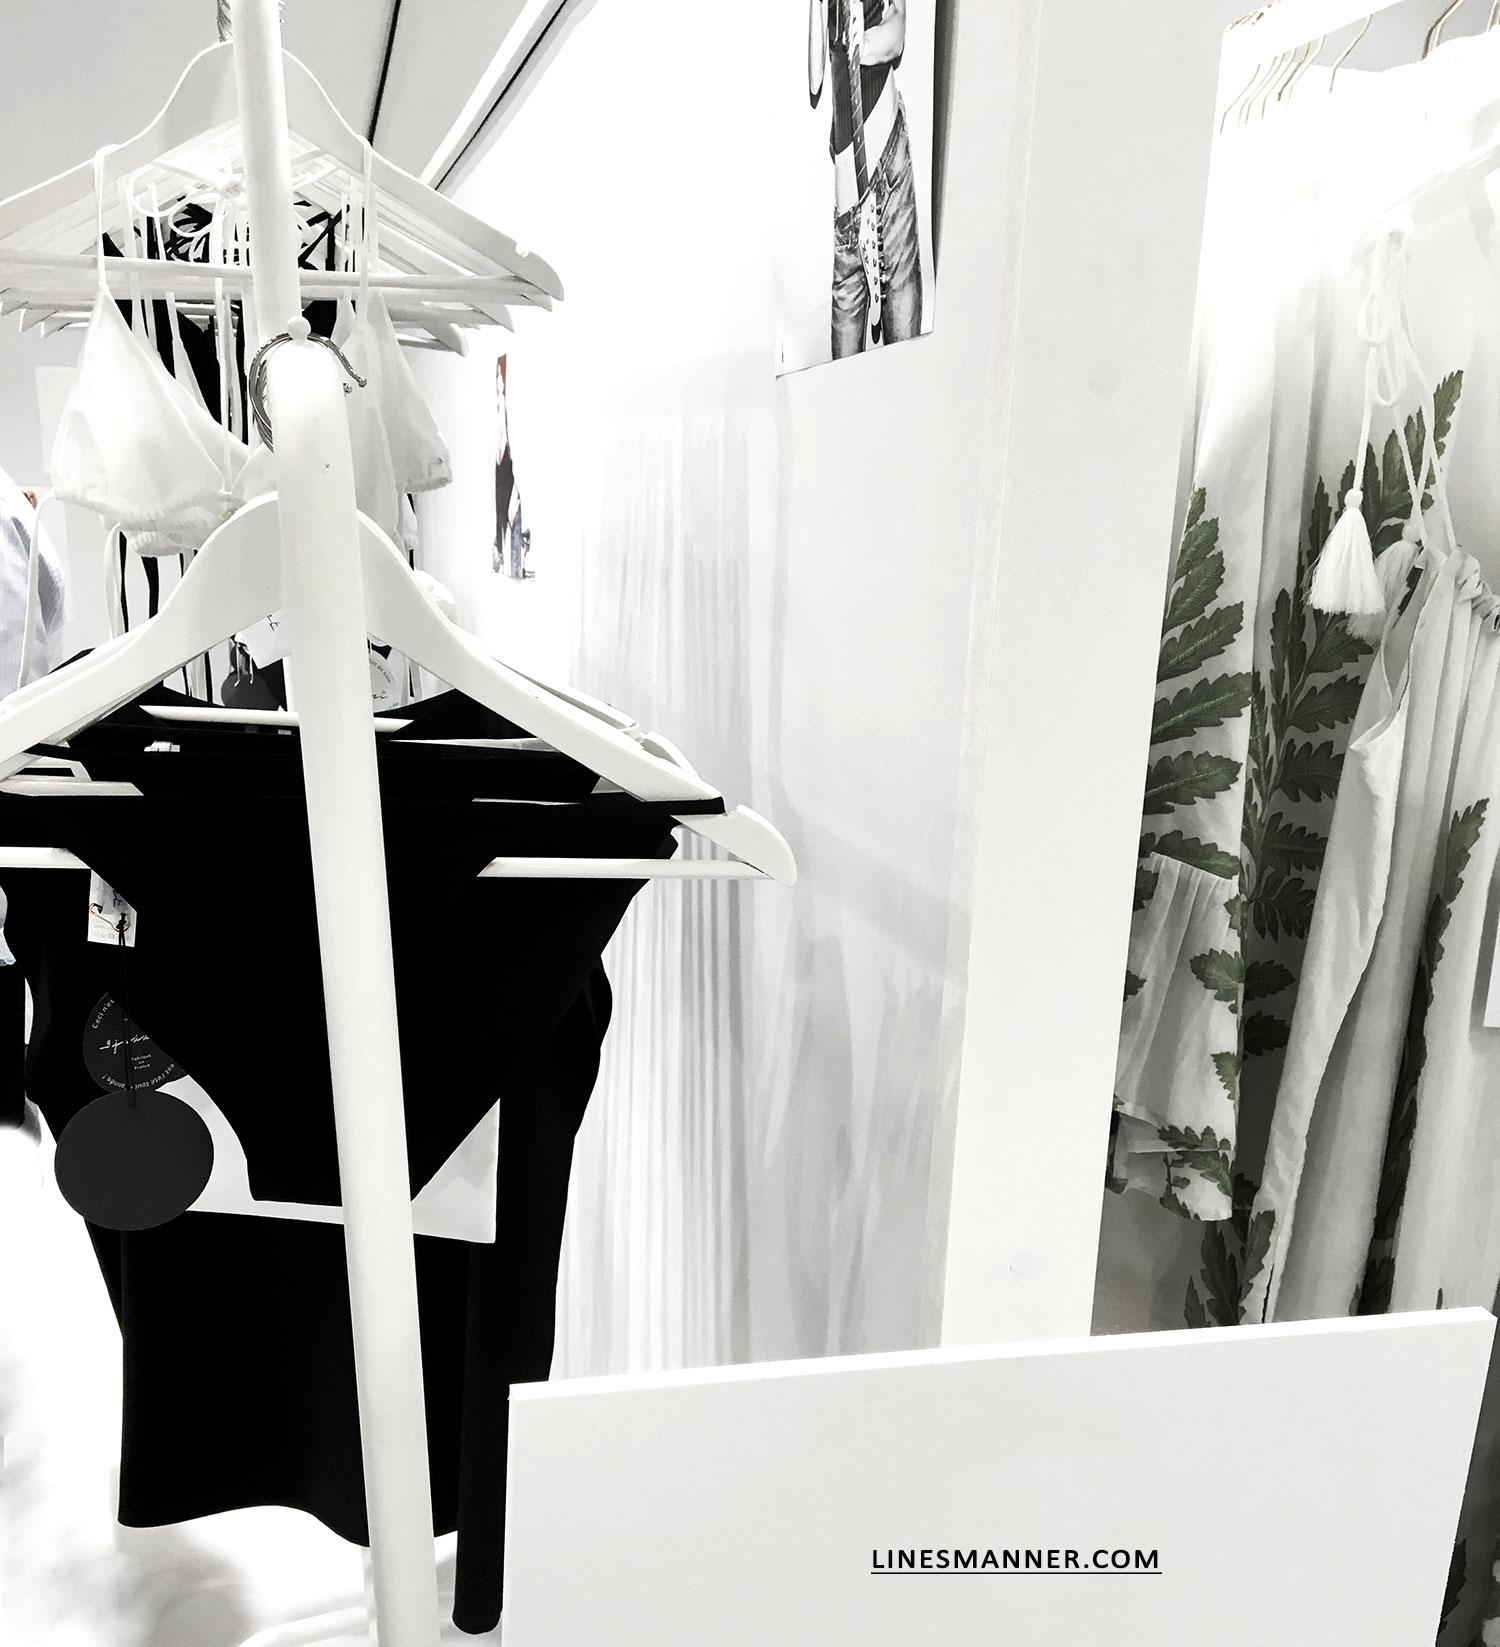 Lines-Manner-Who's_Next-Fashion-International-Show-Paris-Designers-Collection-Creators-Emerging_Designers-Independant-Eco_Fashion-Sustainable-Monochrome-Details-2